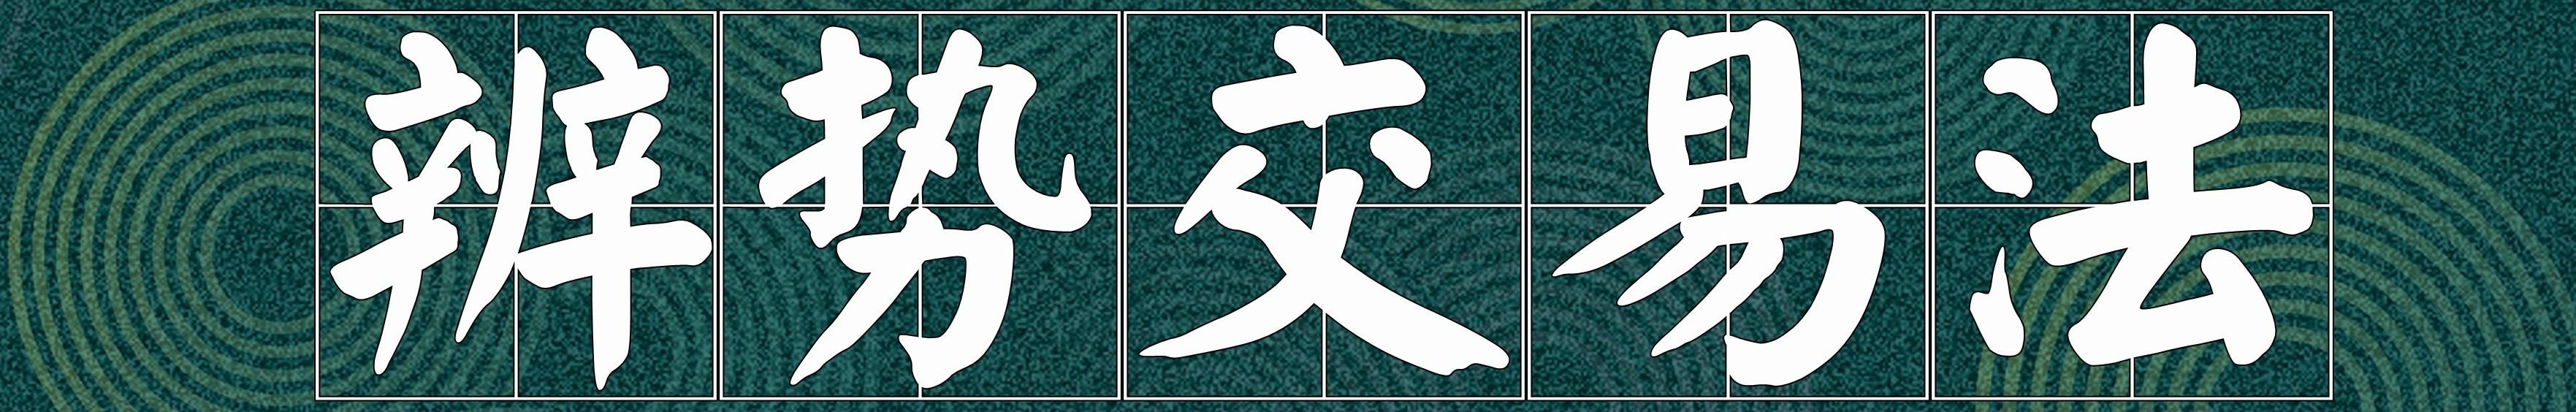 安格斯财经视界 banner